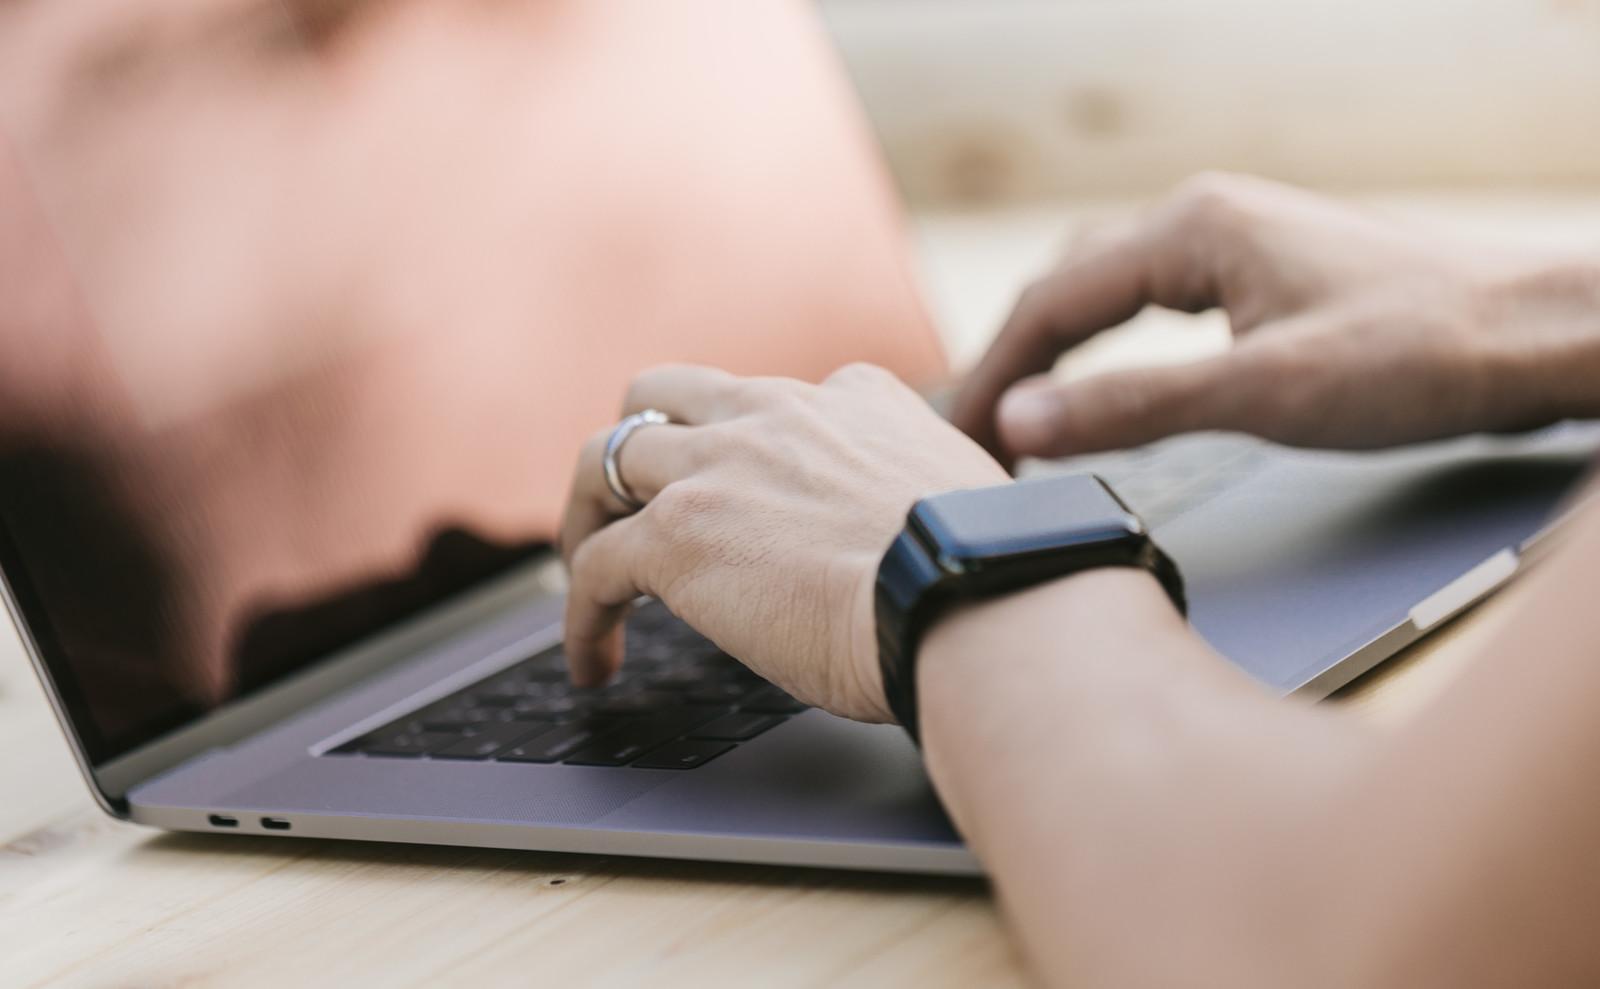 PCで出来る副業を教えます♪スキマ時間に自宅で稼ぐ方法!